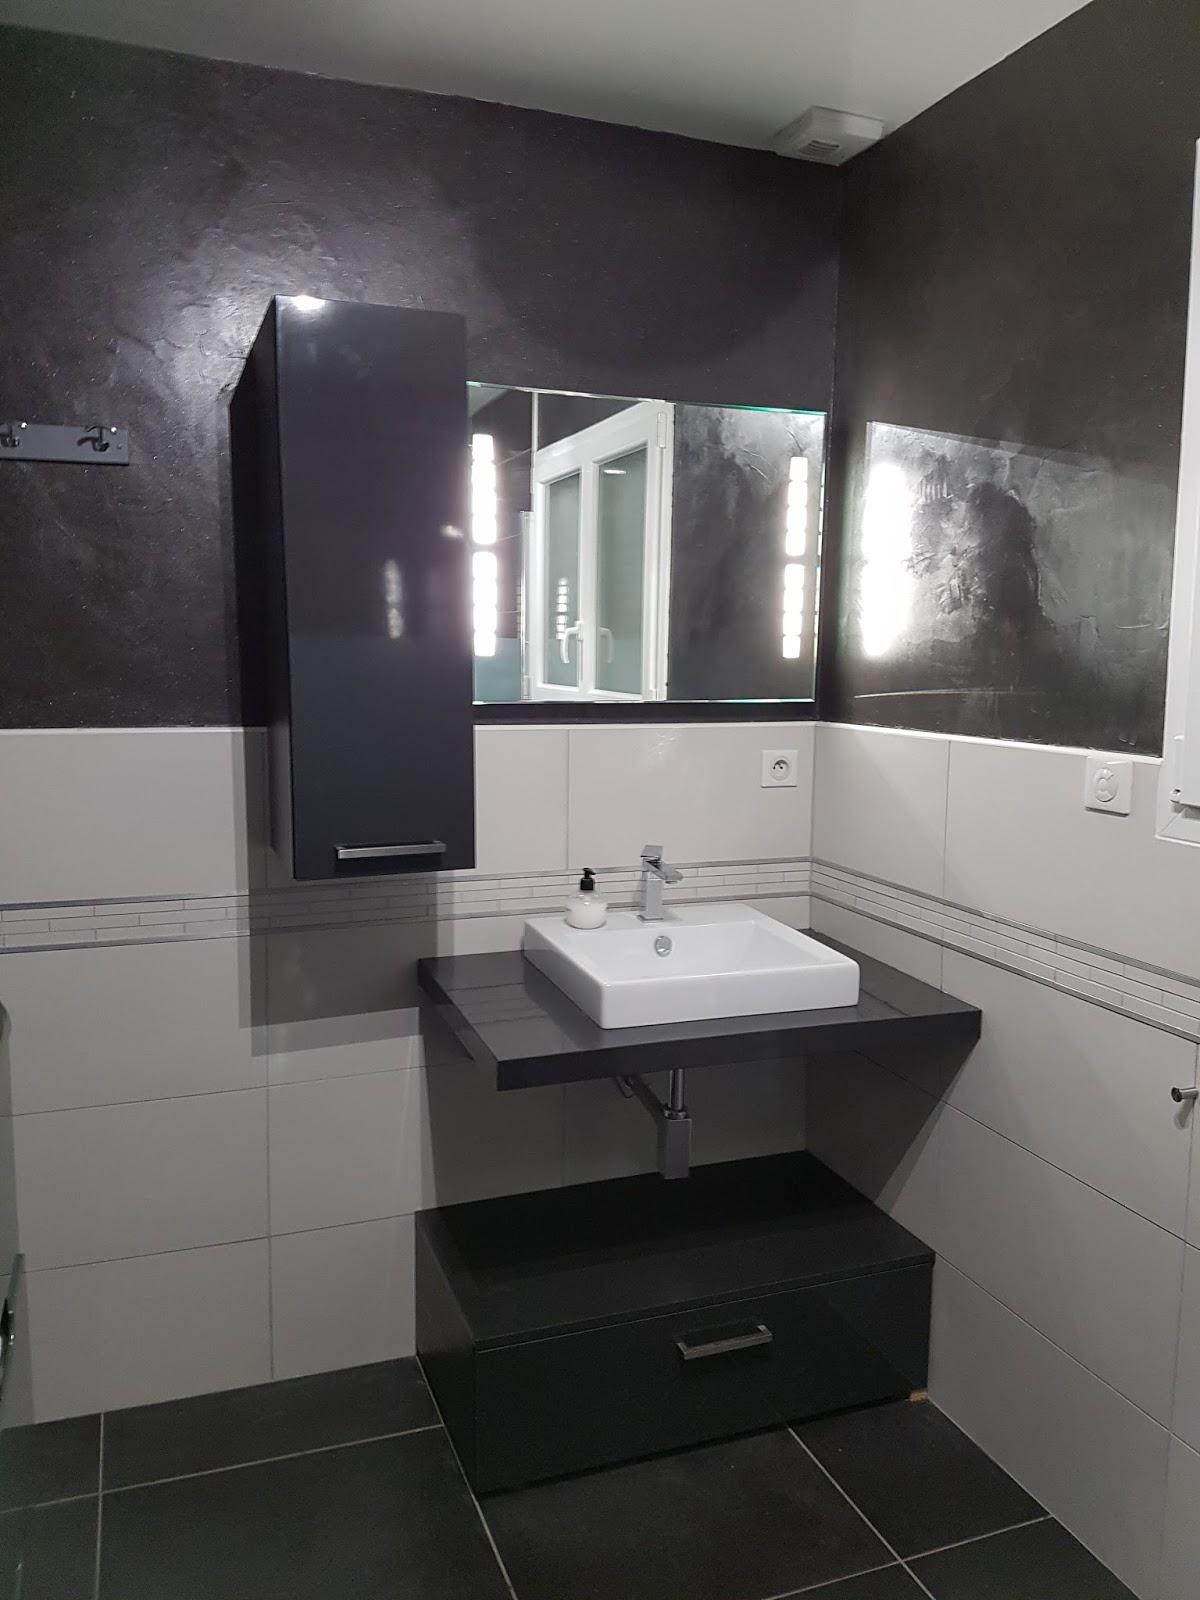 Bricolage de l 39 id e la r alisation salle de bain for Faience salle de bain 2016